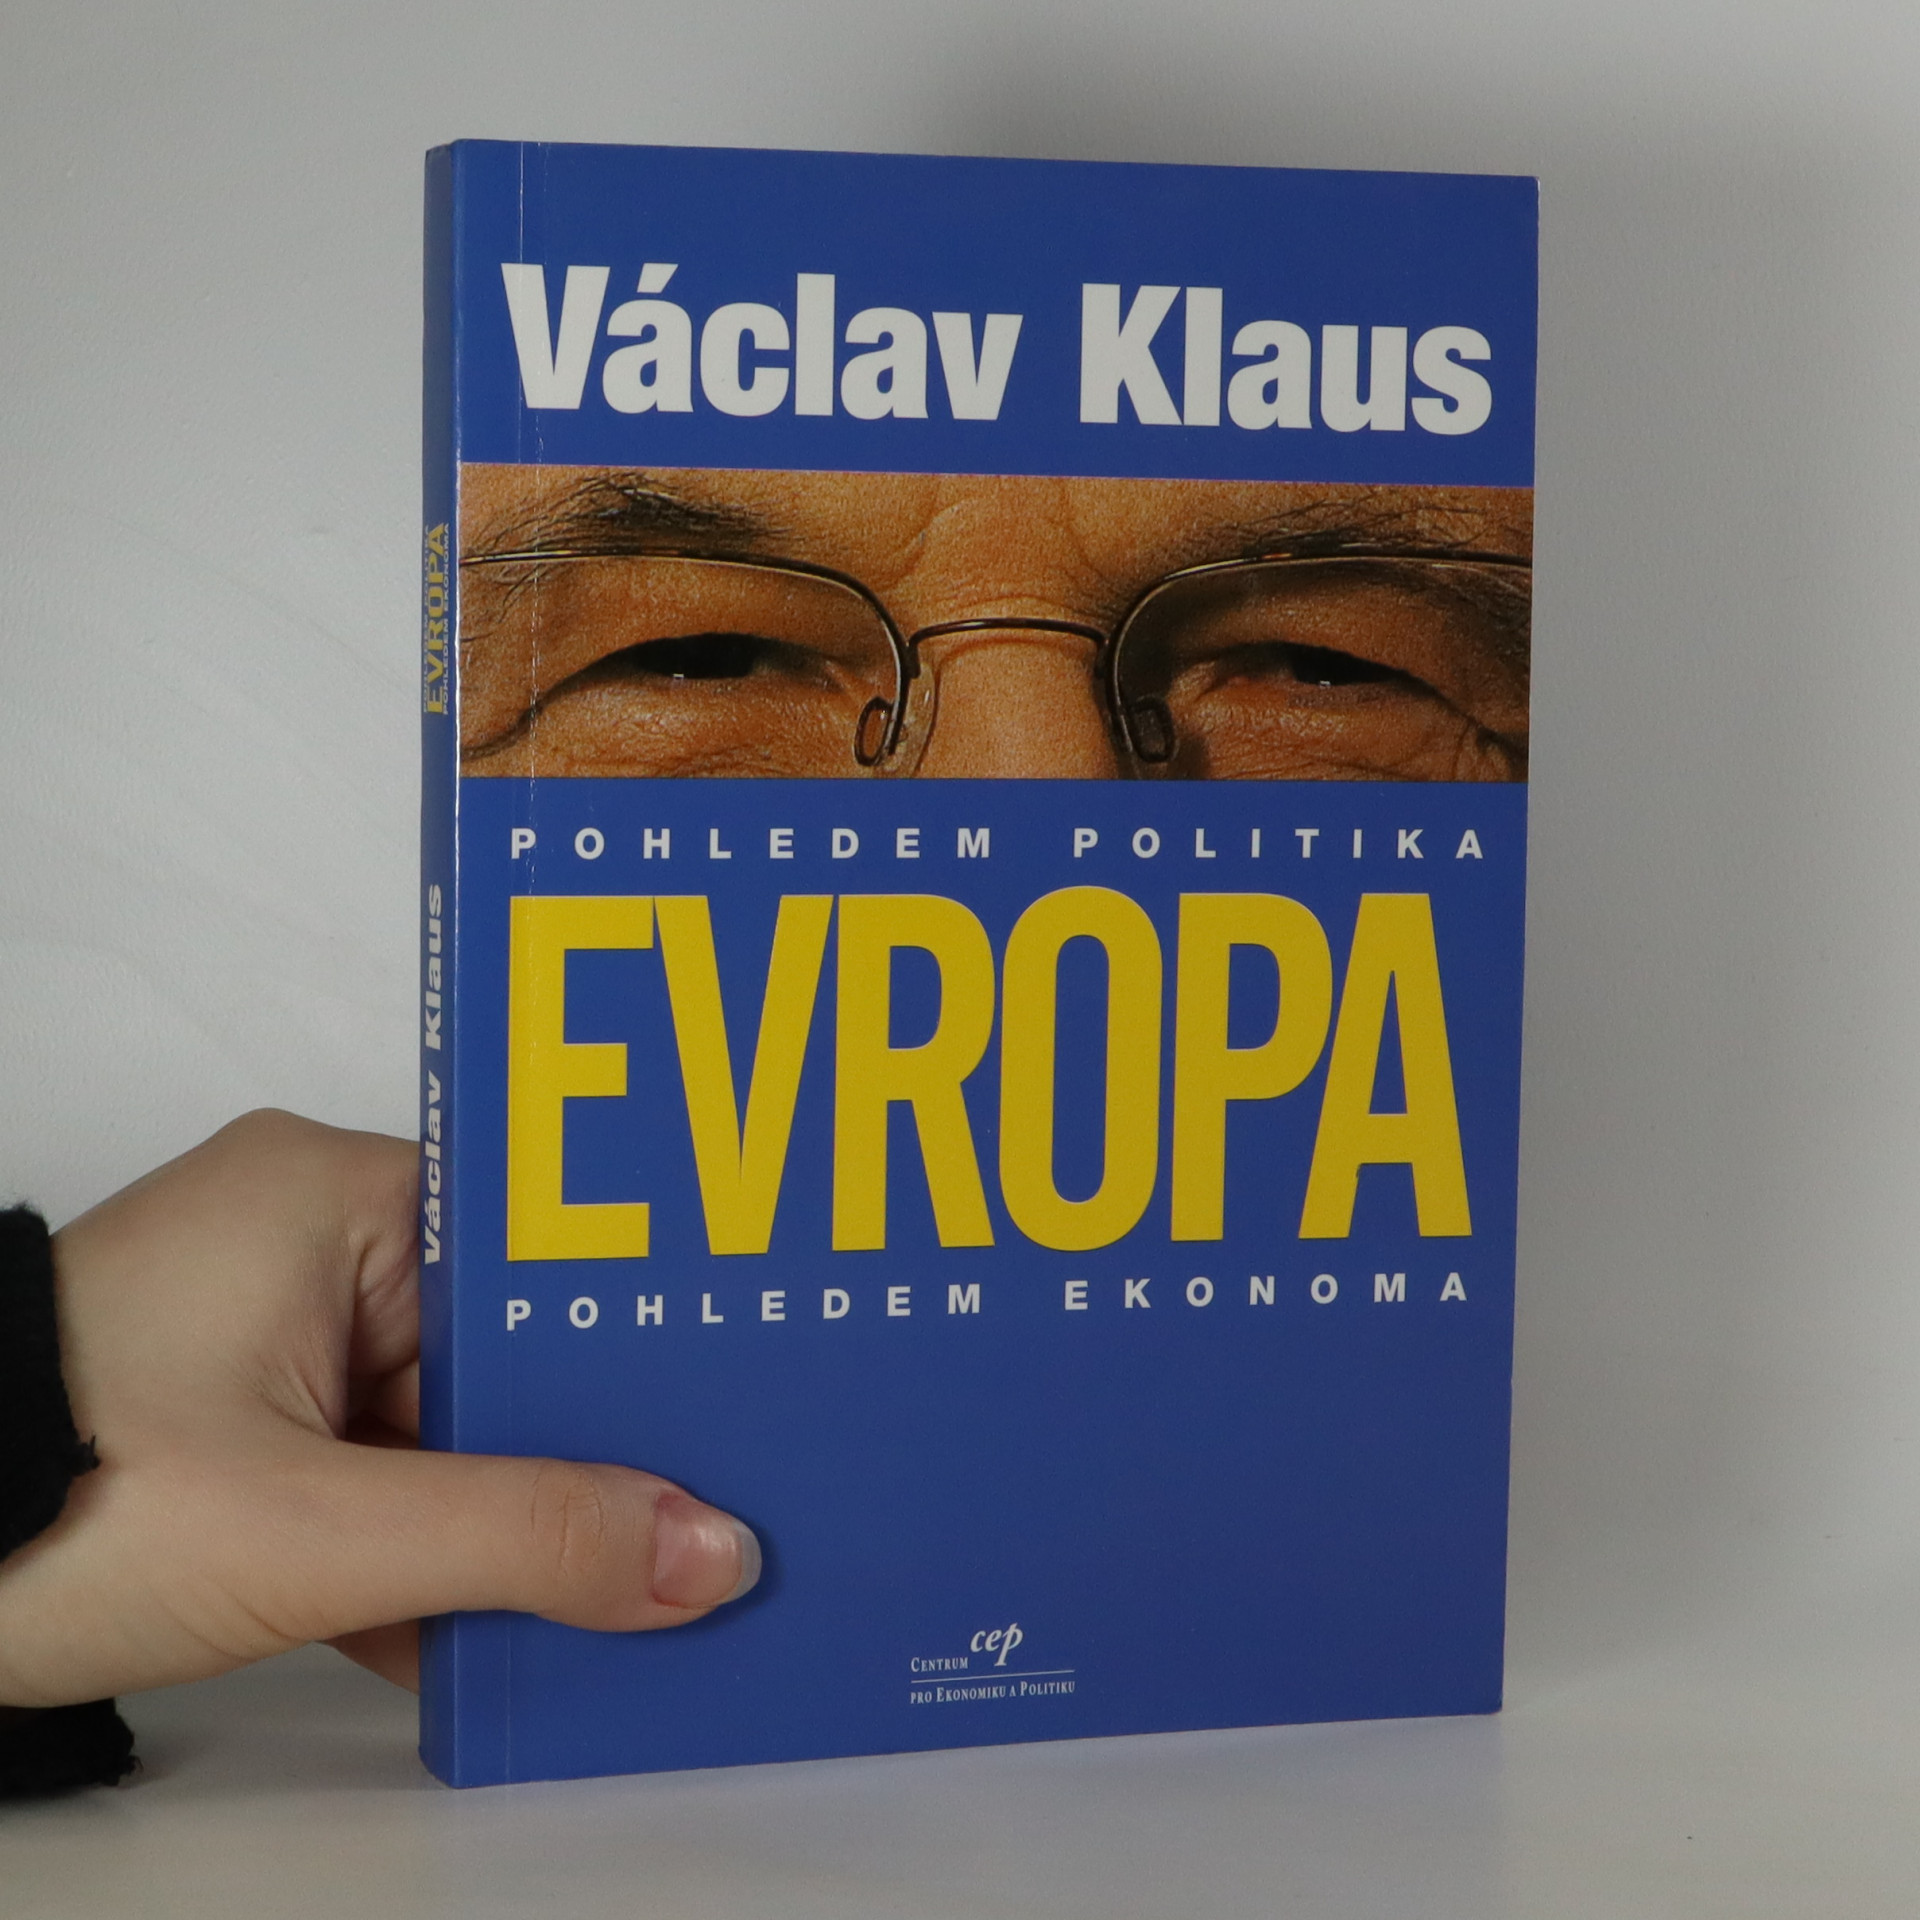 antikvární kniha Evropa pohledem politika. Pohledem ekonoma, 2001